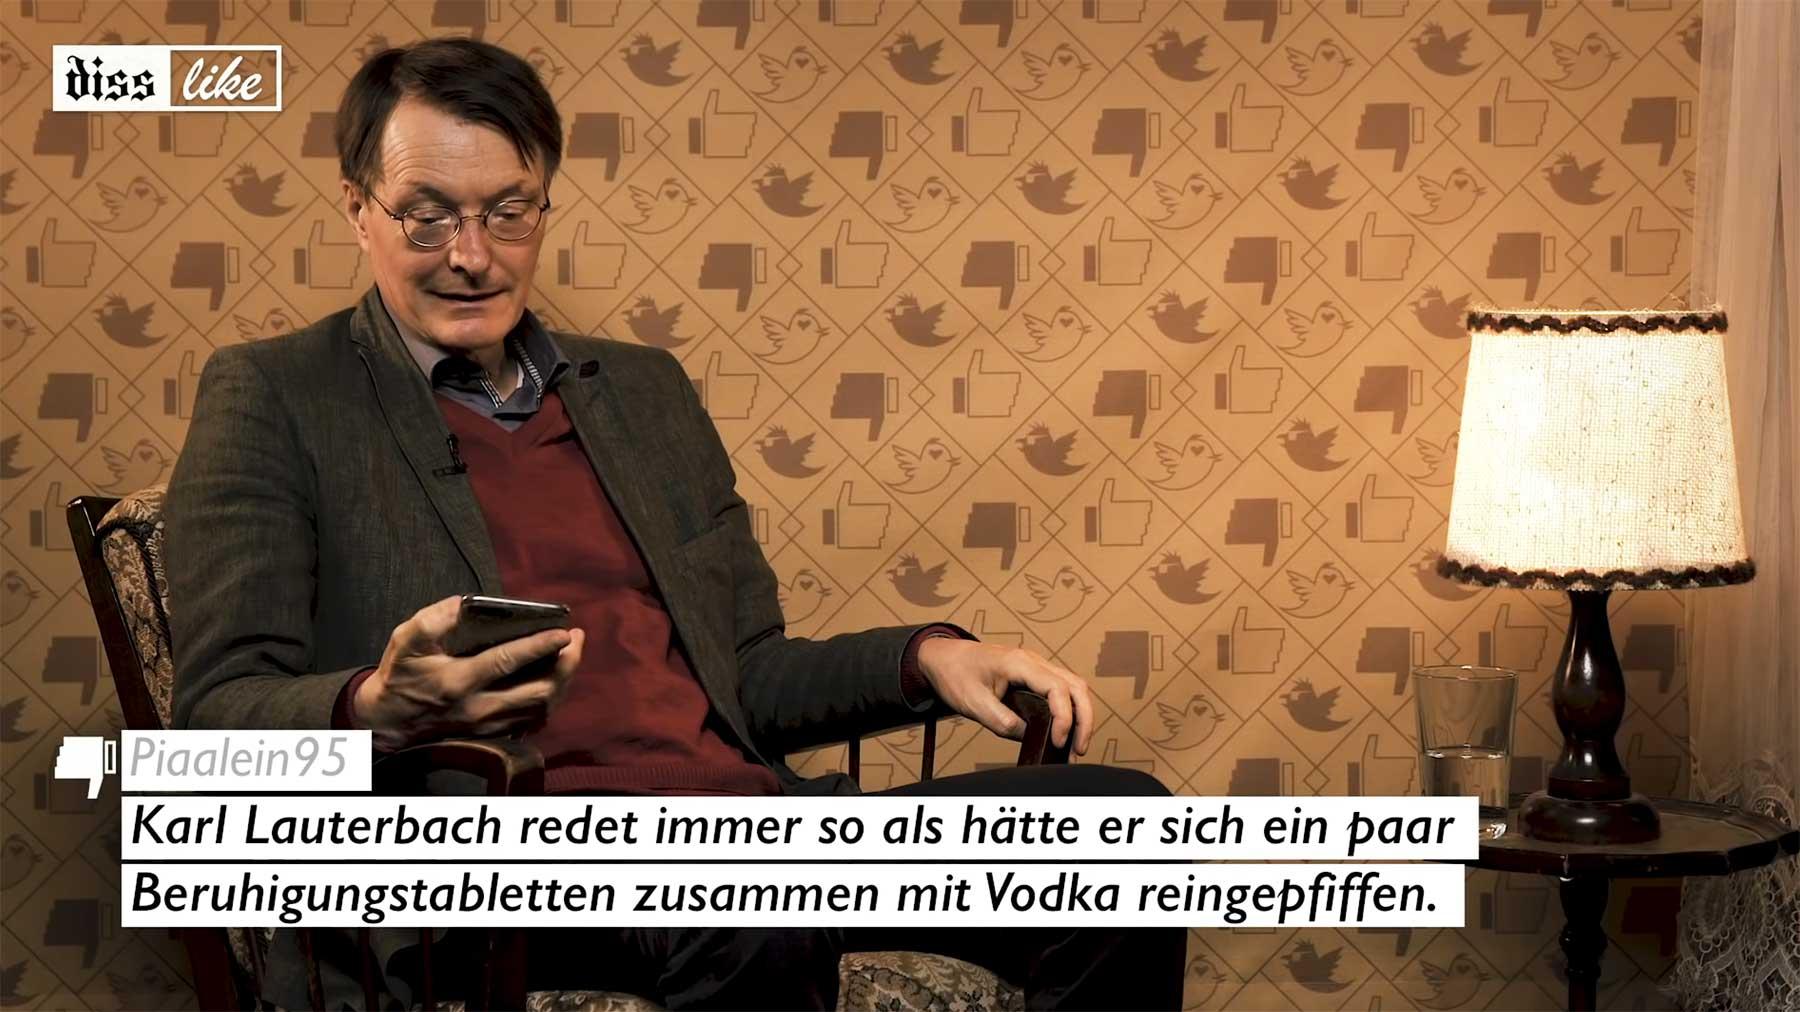 DISSLIKE: Karl Lauterbach reagiert auf kritische Social-Media-Posts